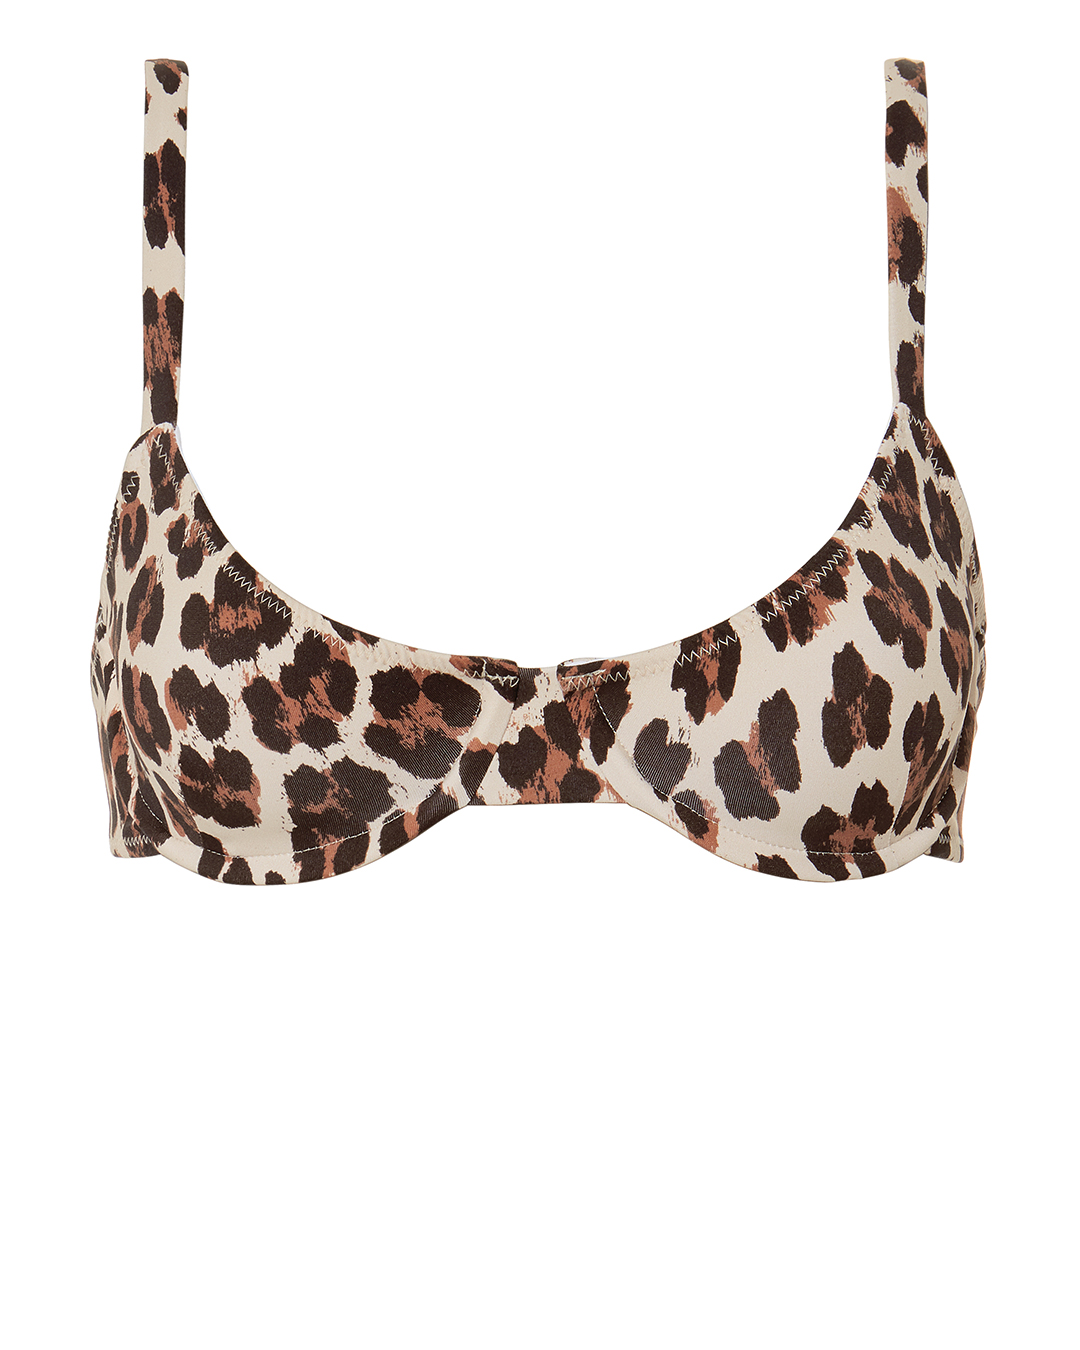 Mykela Leopard Bikini Top by Caroline Constas Mer